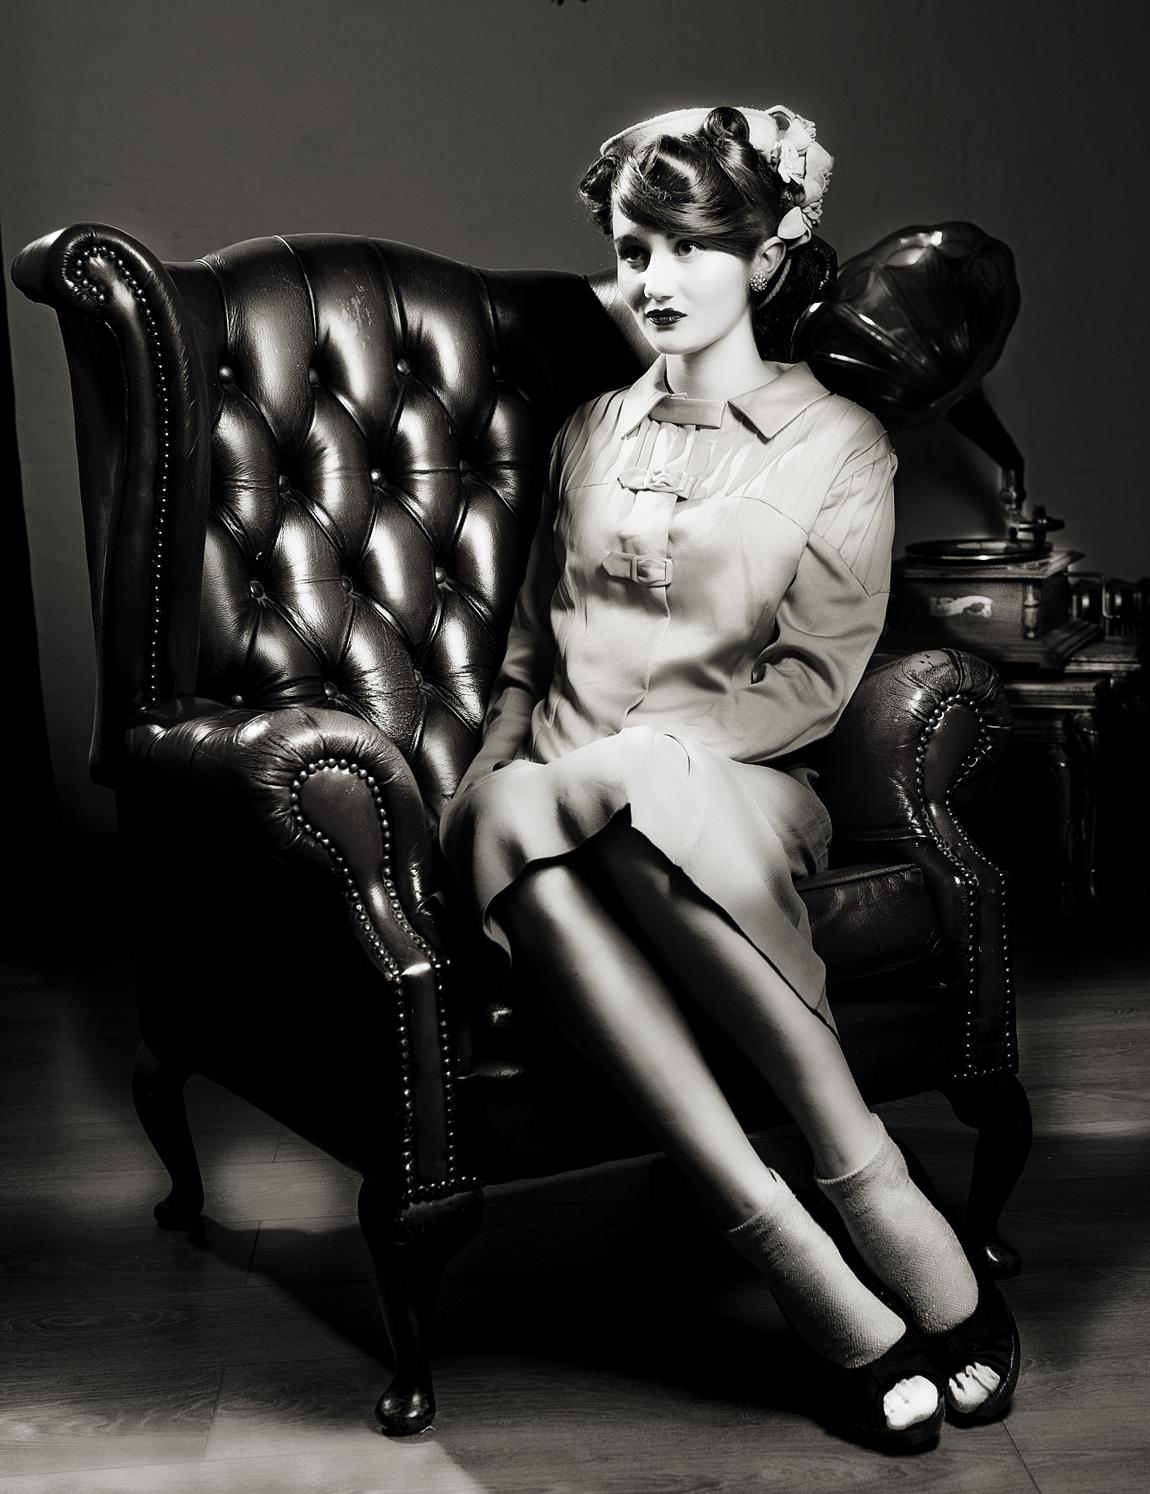 dennisdavis_photography_fashion_1940_hair_makeup.jpg